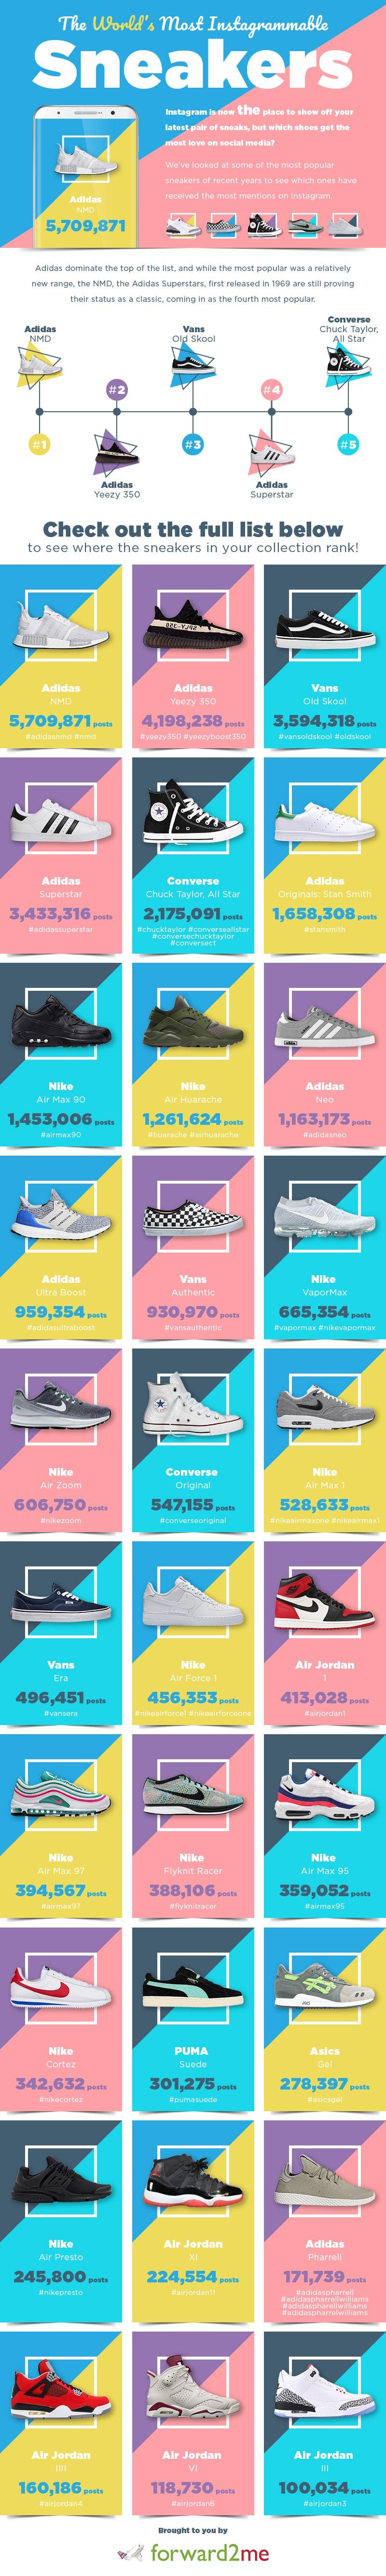 Baskets Jordan, Nike, Vans